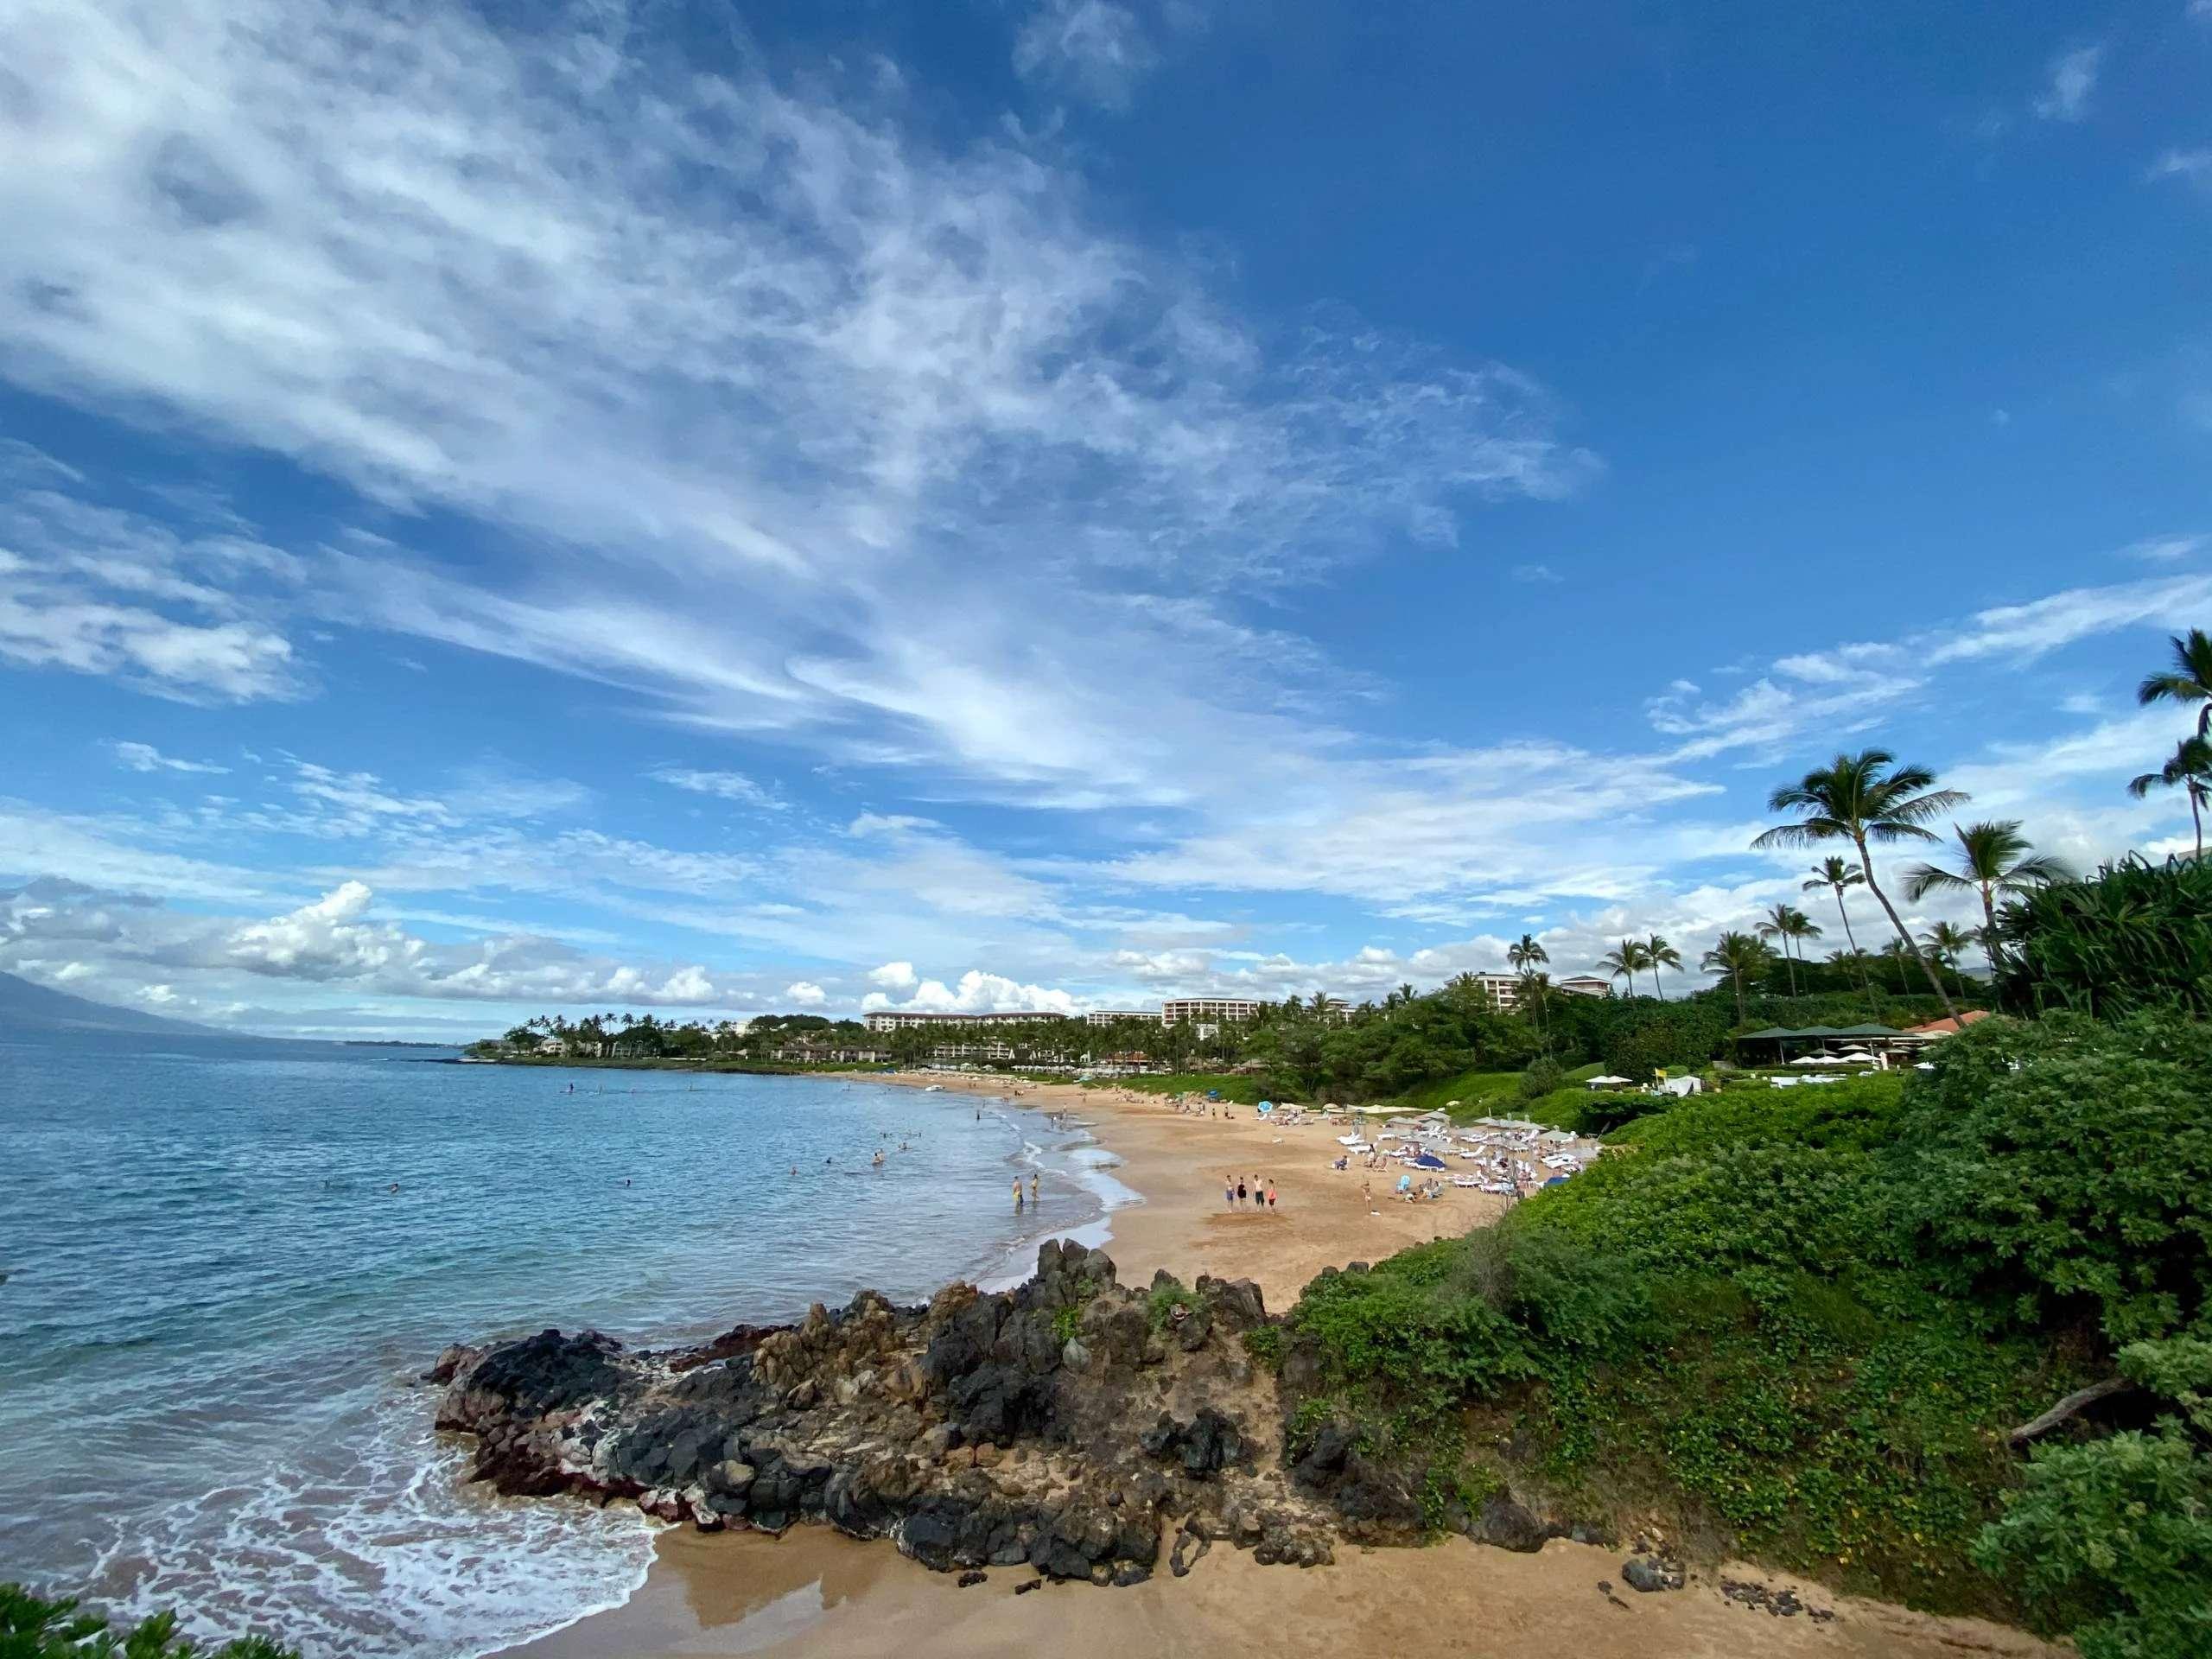 Review: The Grand Wailea, A Waldorf Astoria Resort in Maui